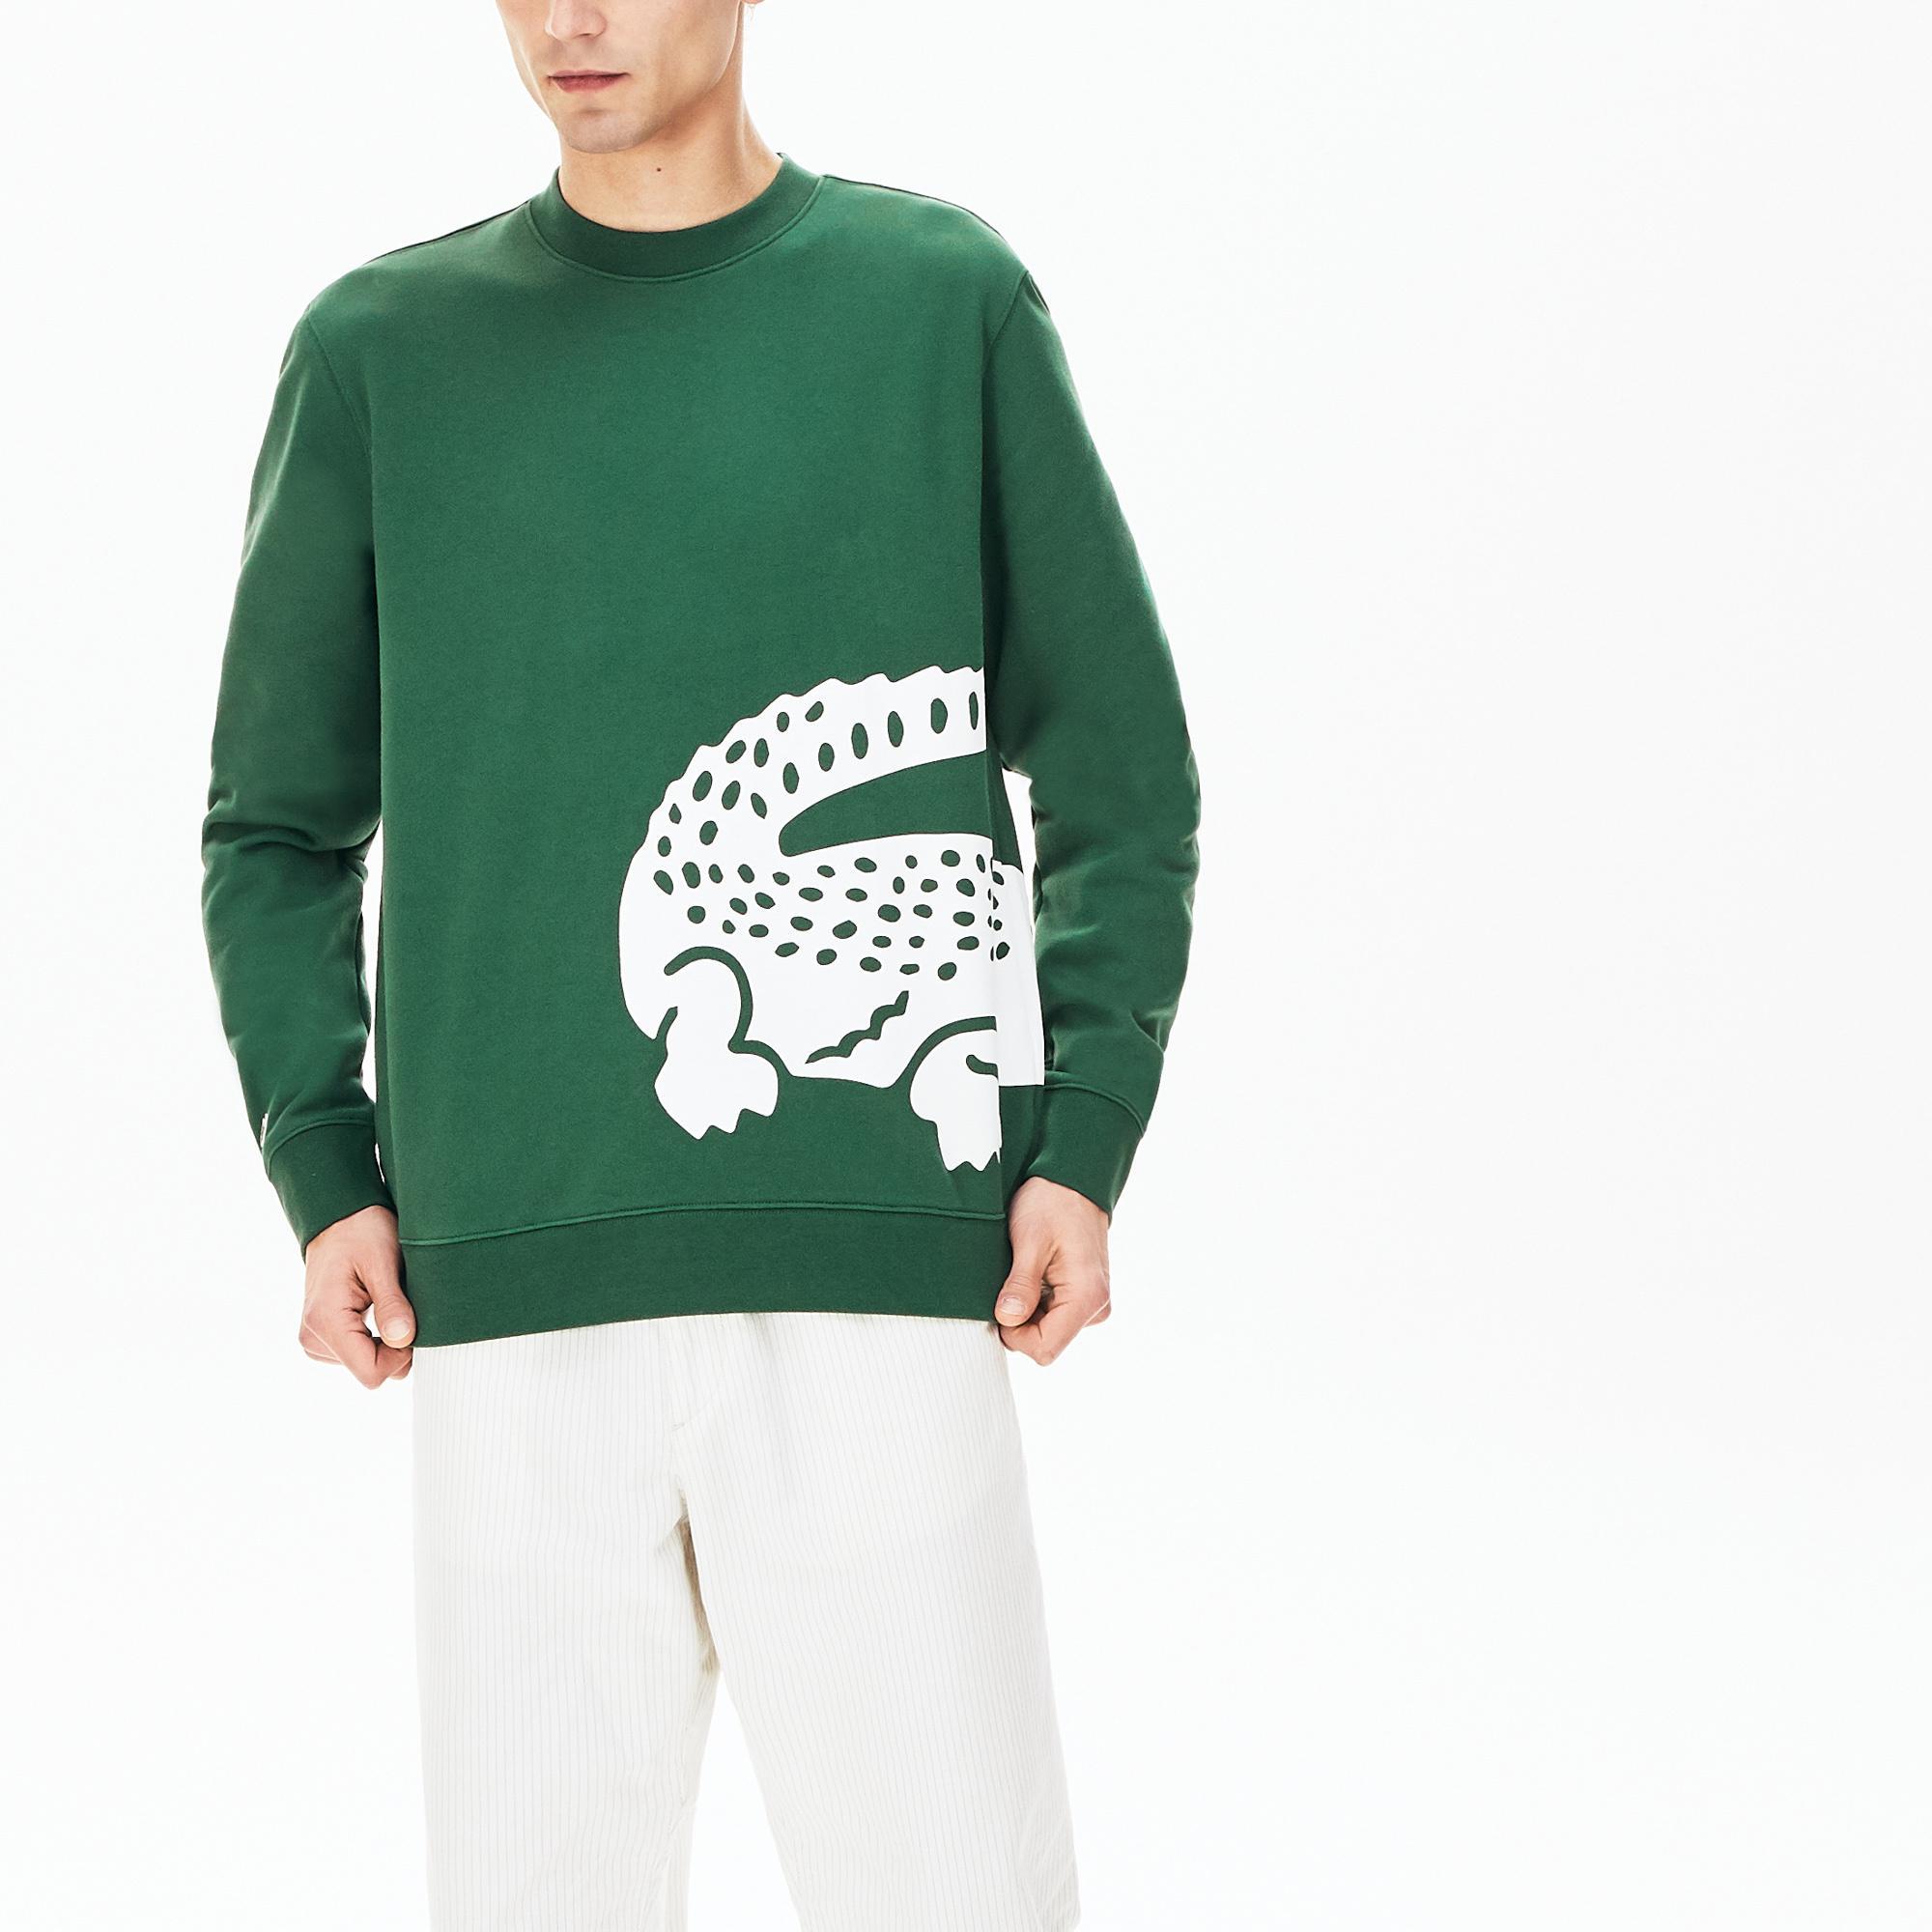 Lacoste Men's Oversized Crocodile Crew Neck Sweatshirt